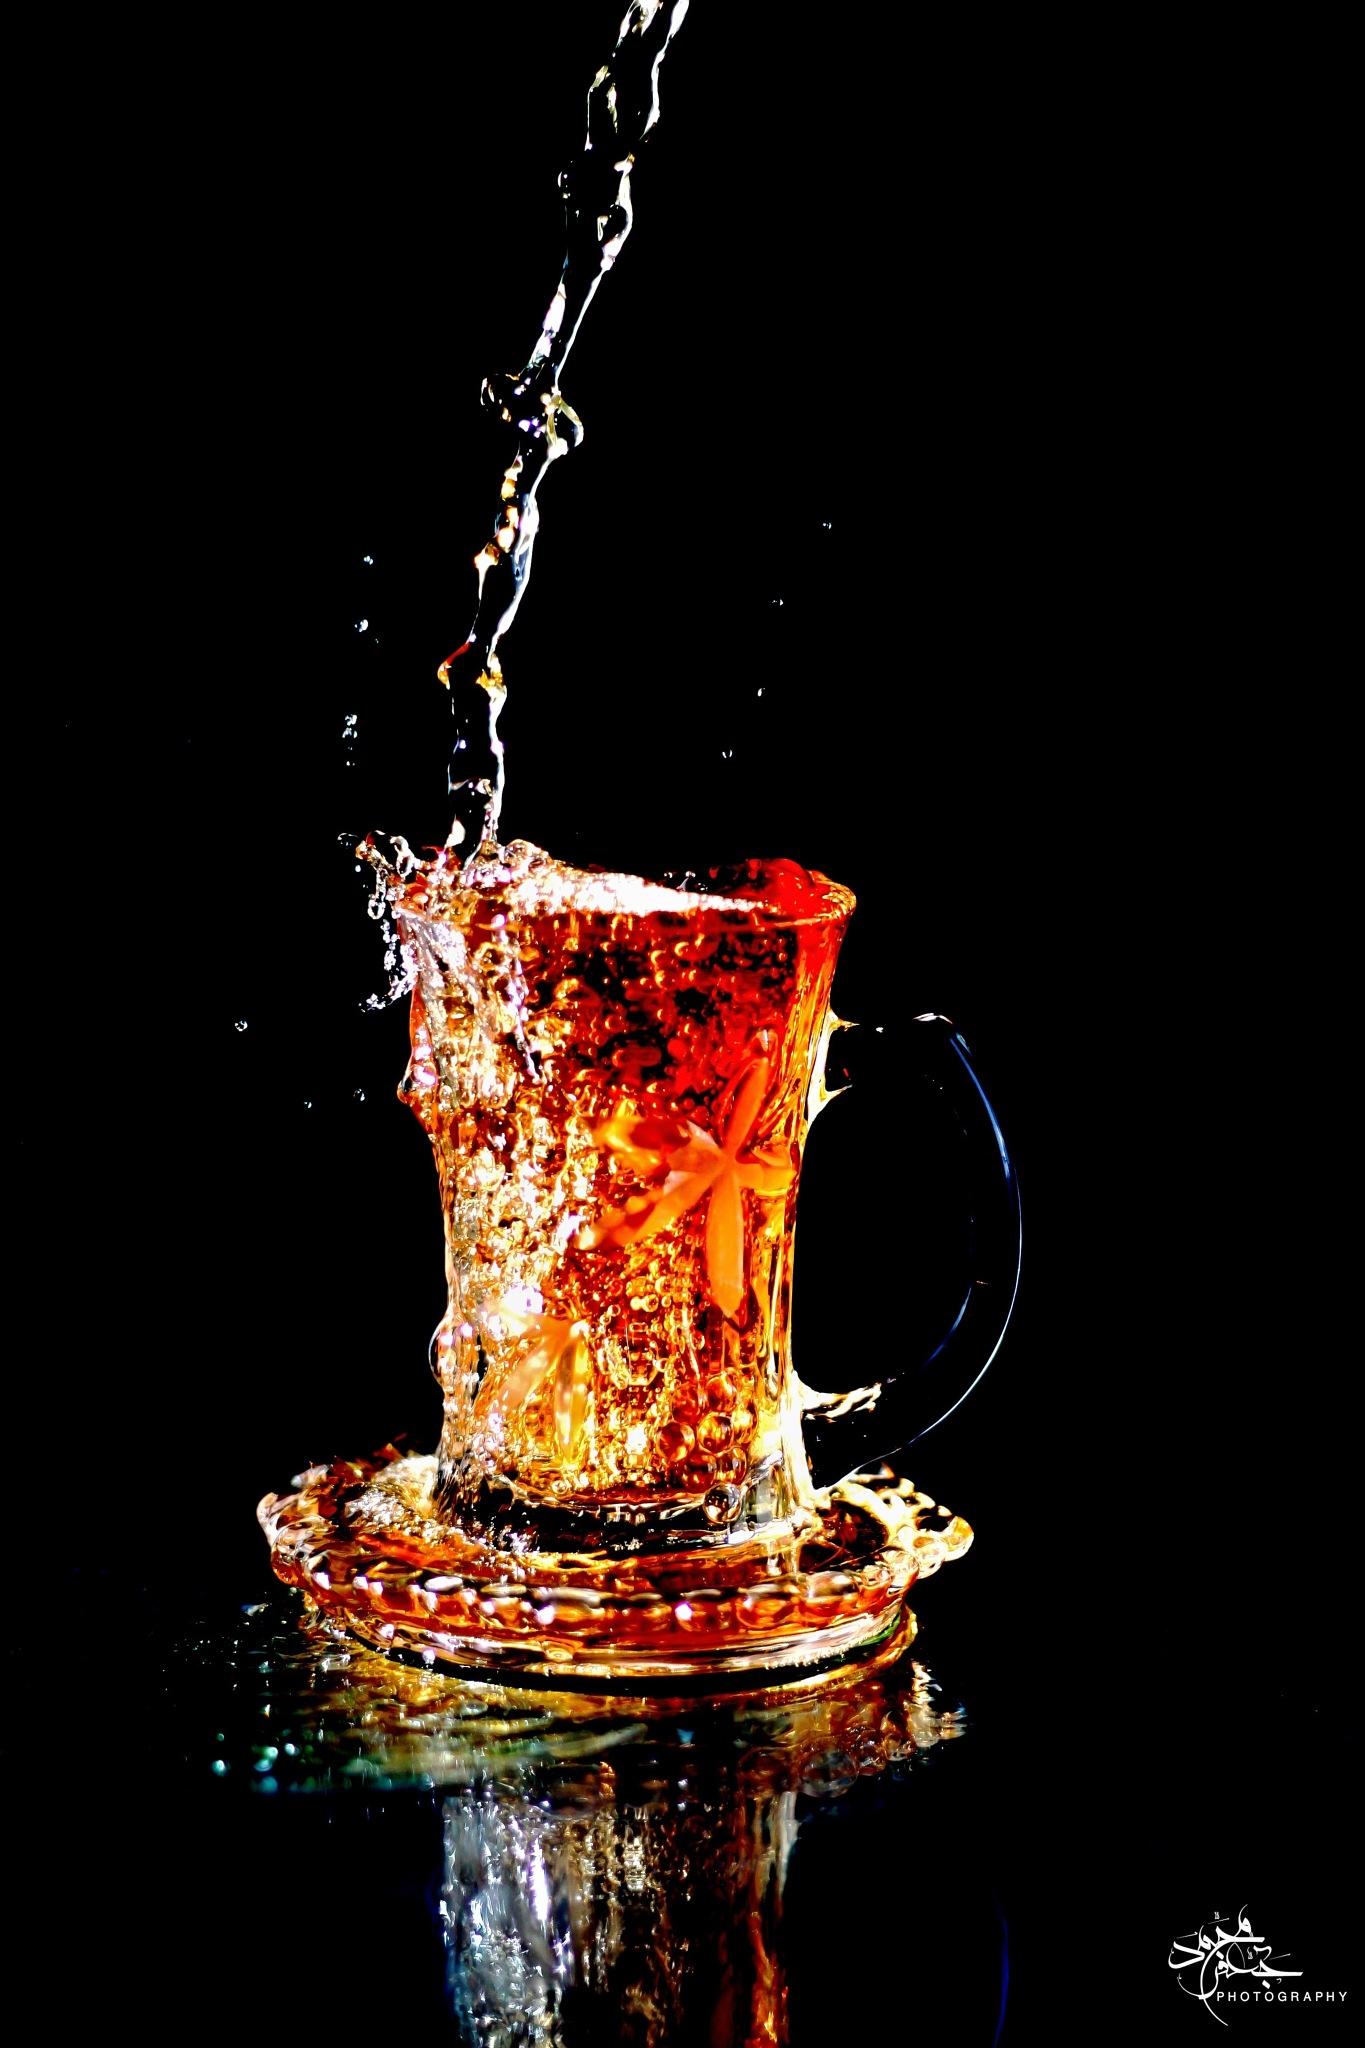 A cup of tea by Mohamed gaafar